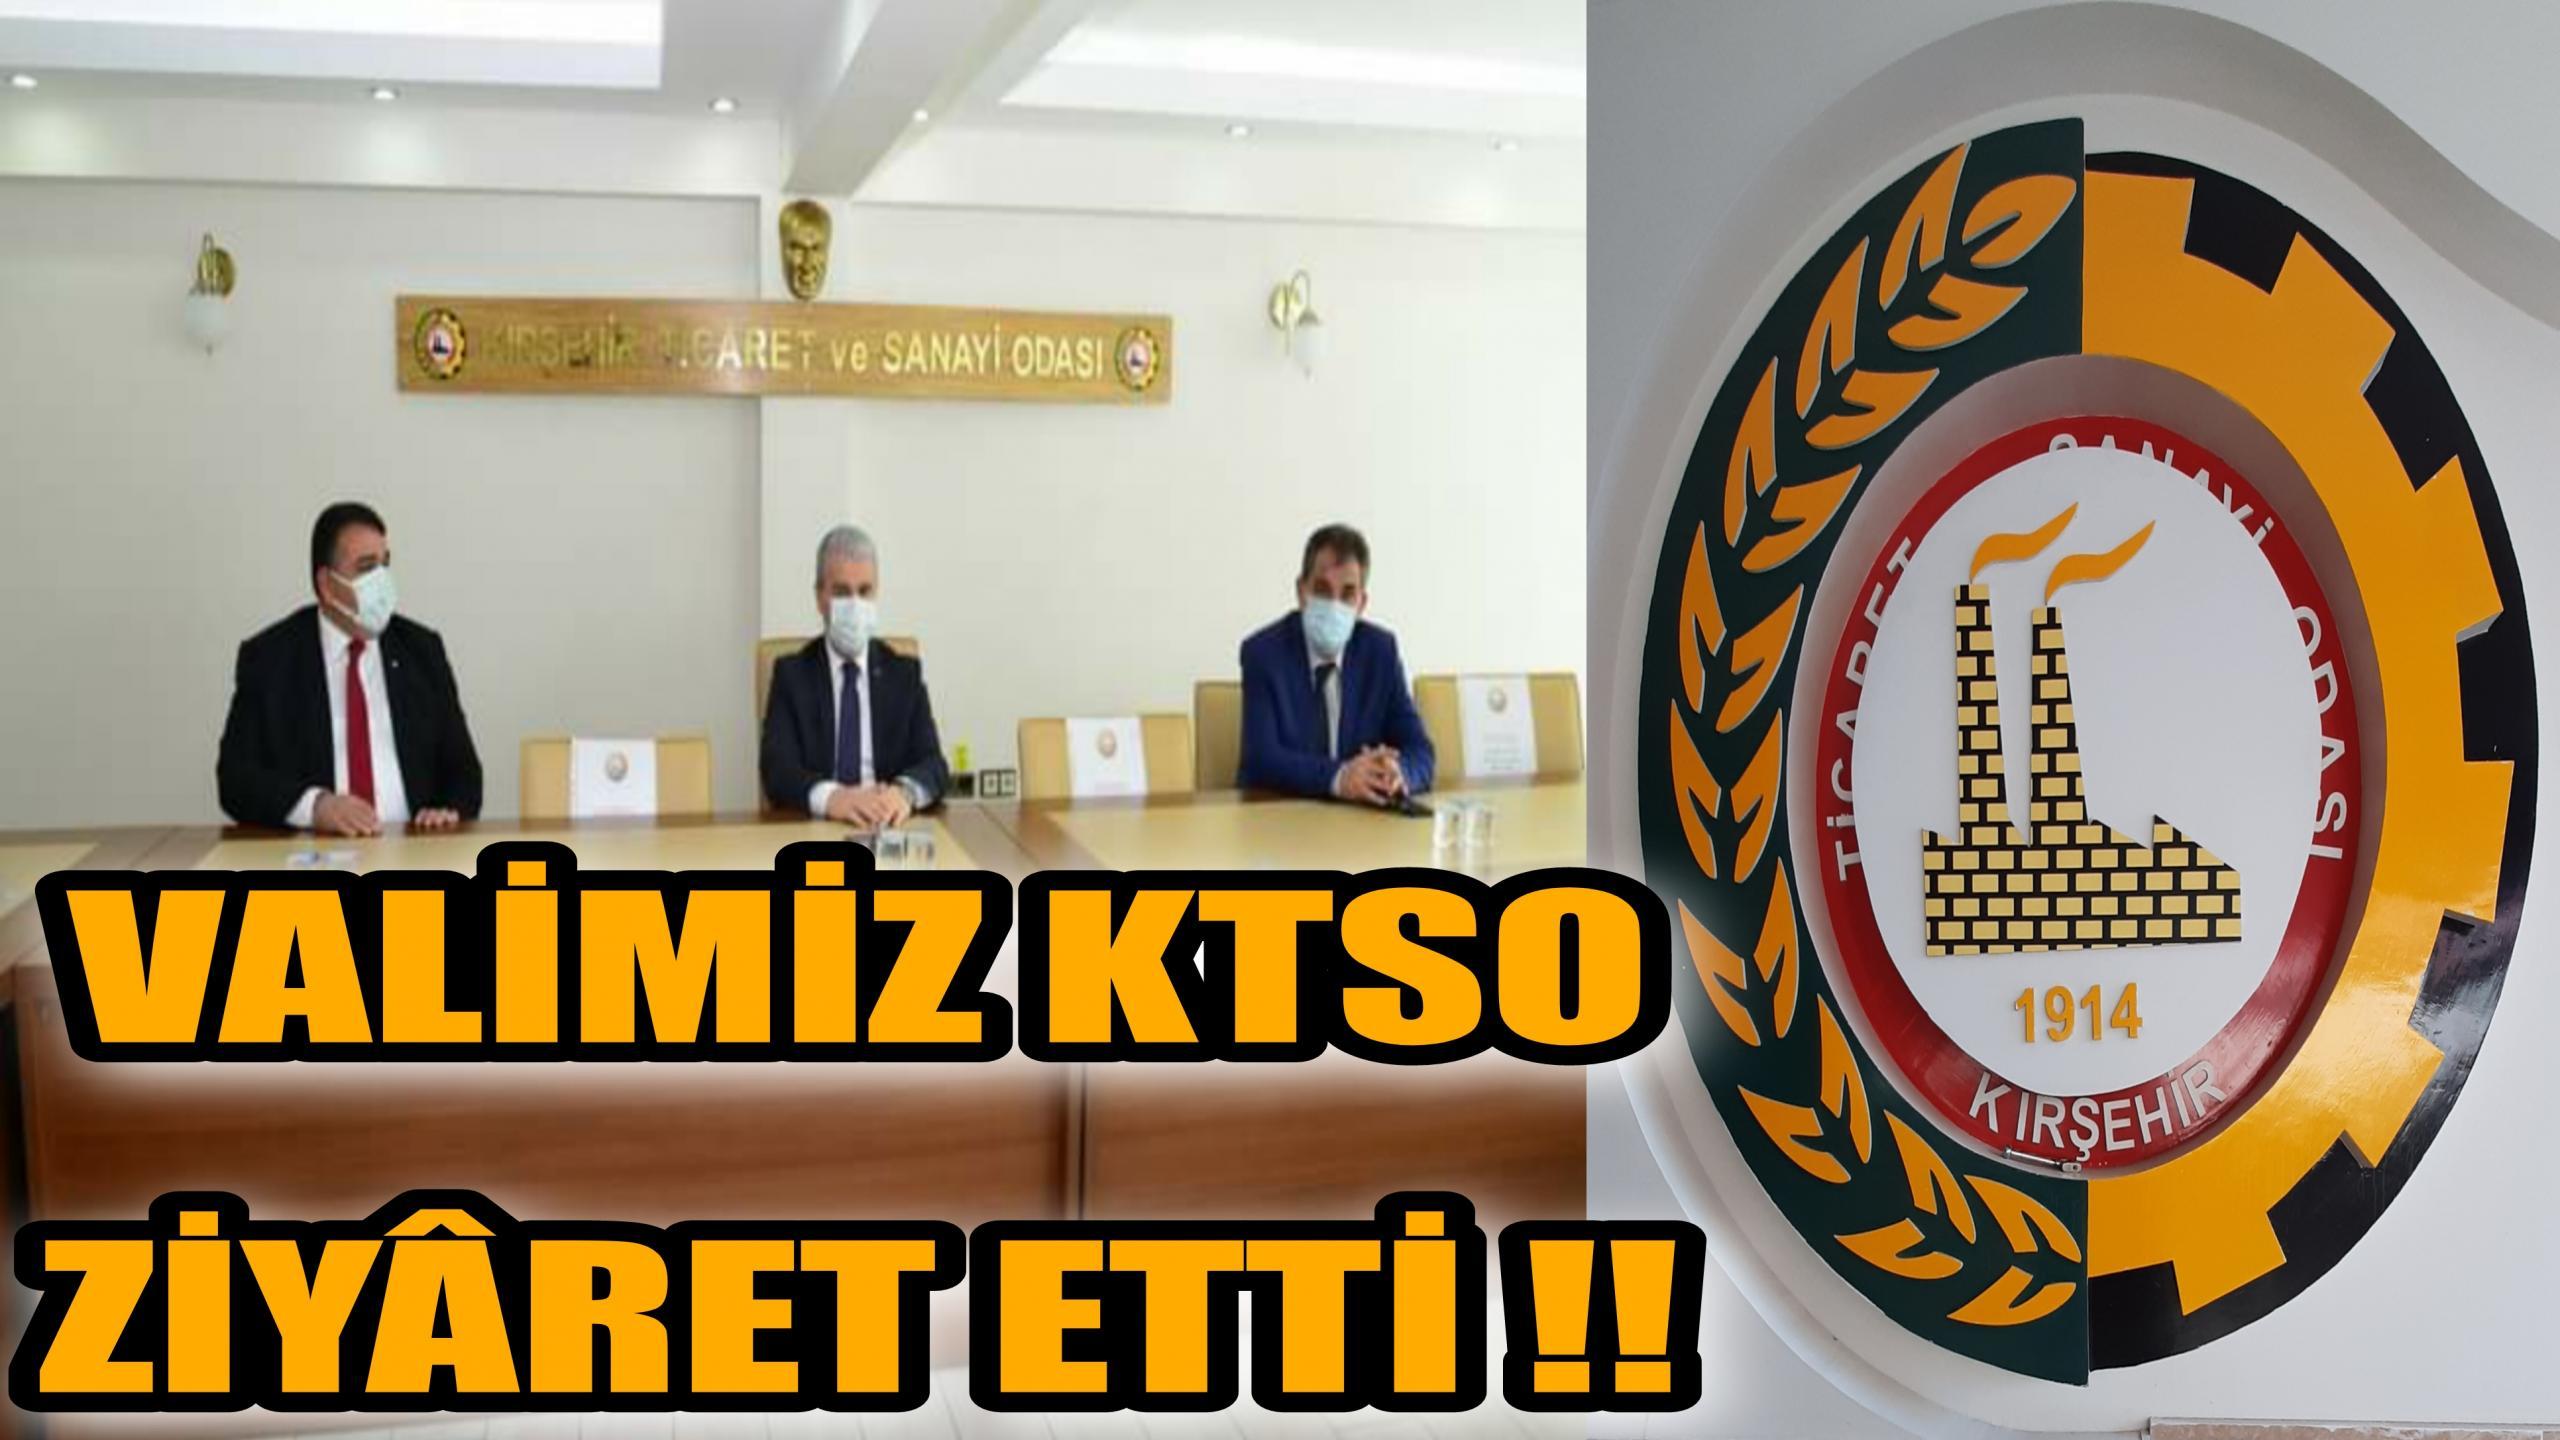 VALİ İBRAHİM AKIN KTSO yu ZİYÂRET ETTİ !!